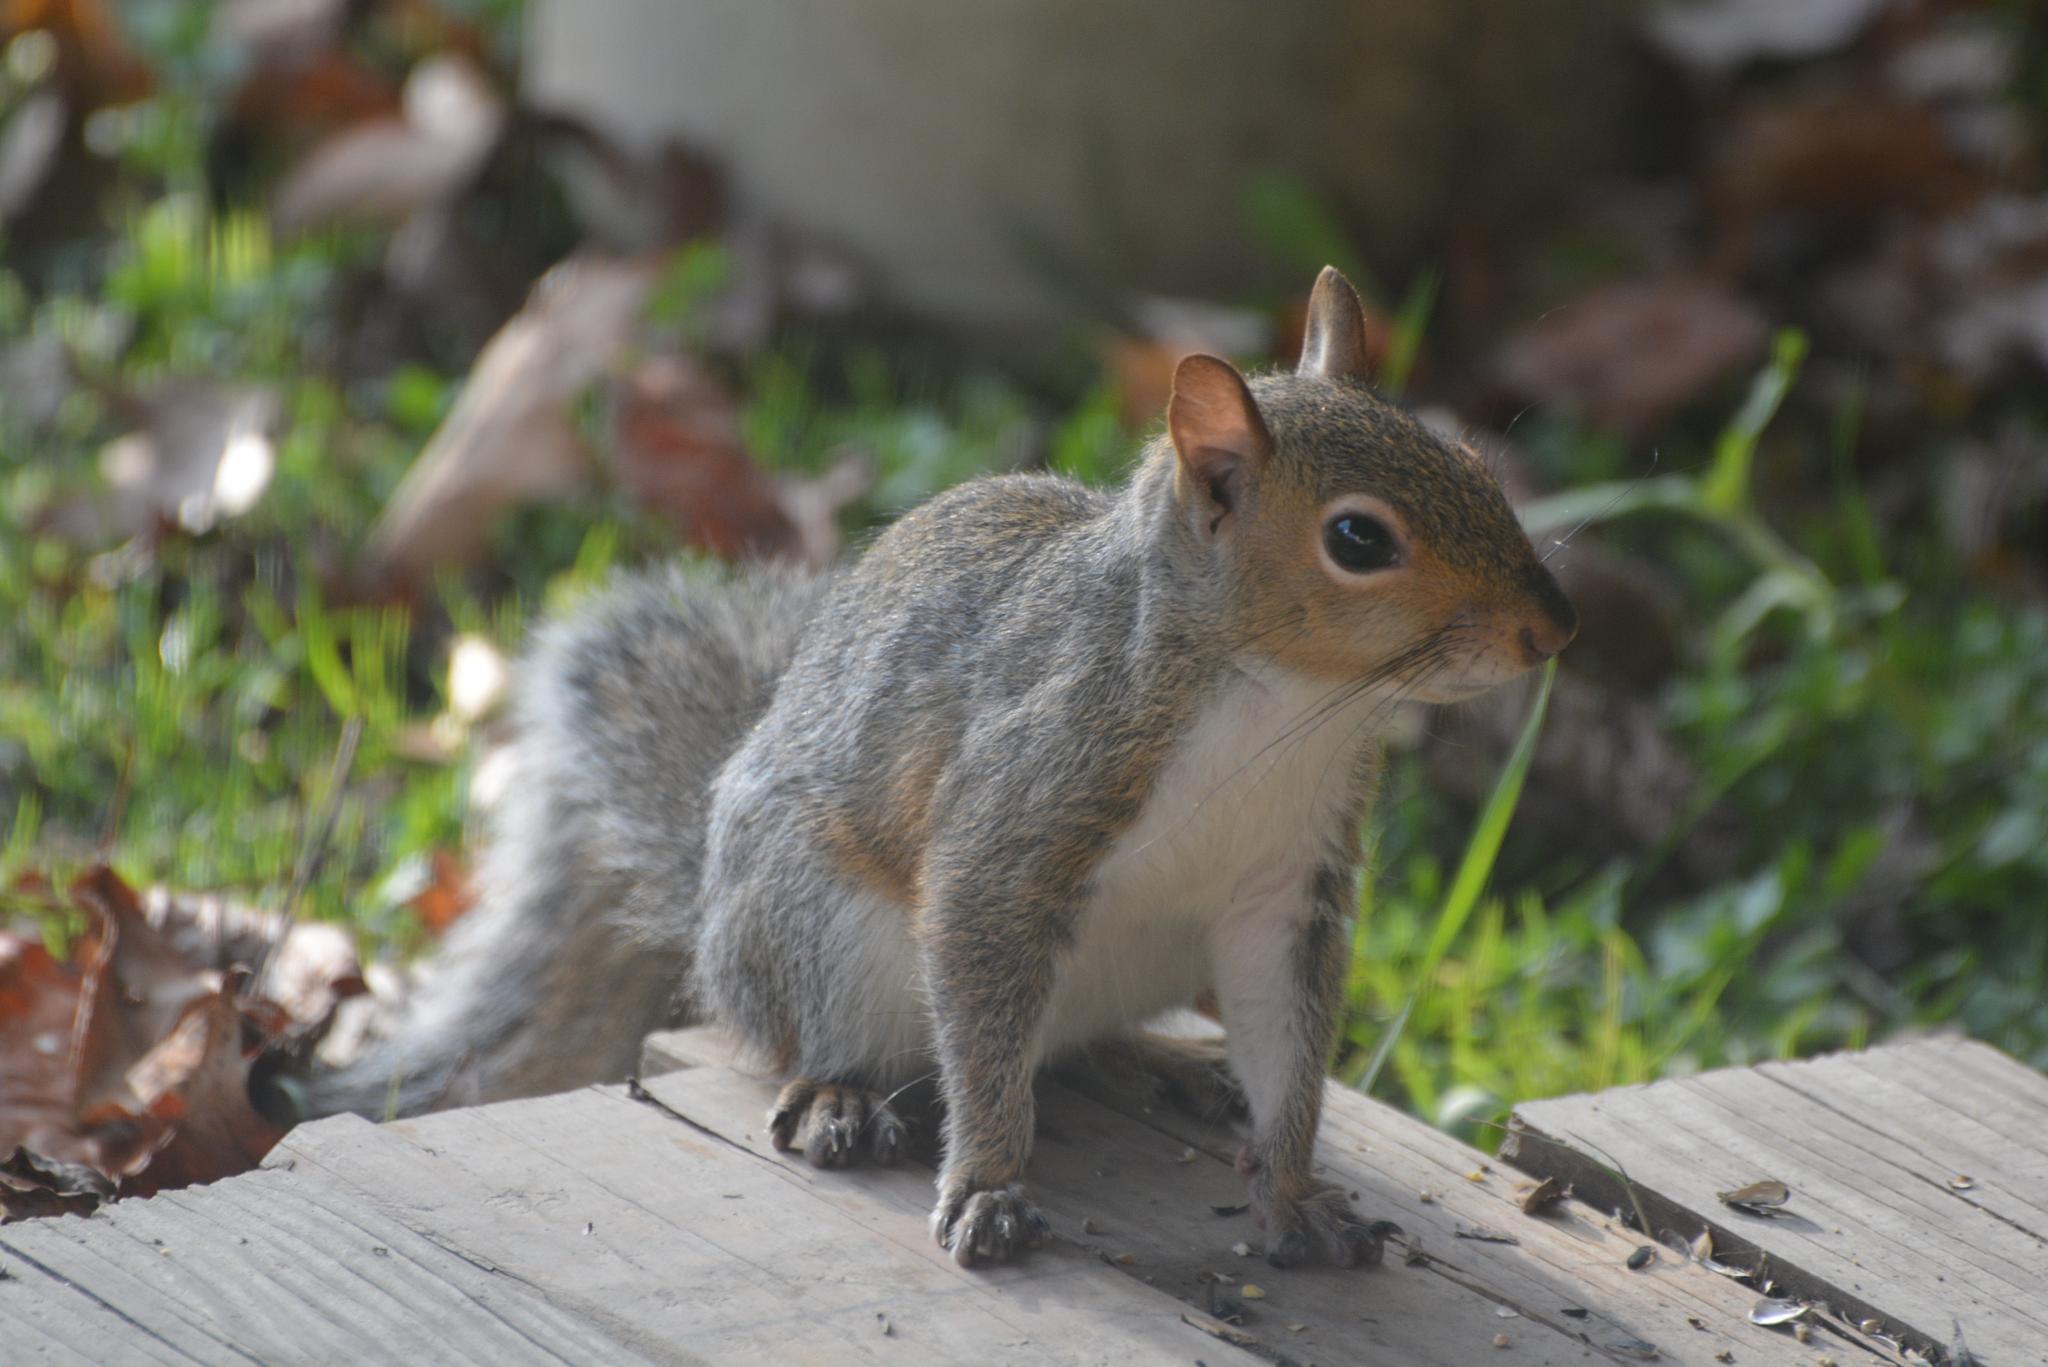 Mooching squirrel by Gingerjake2